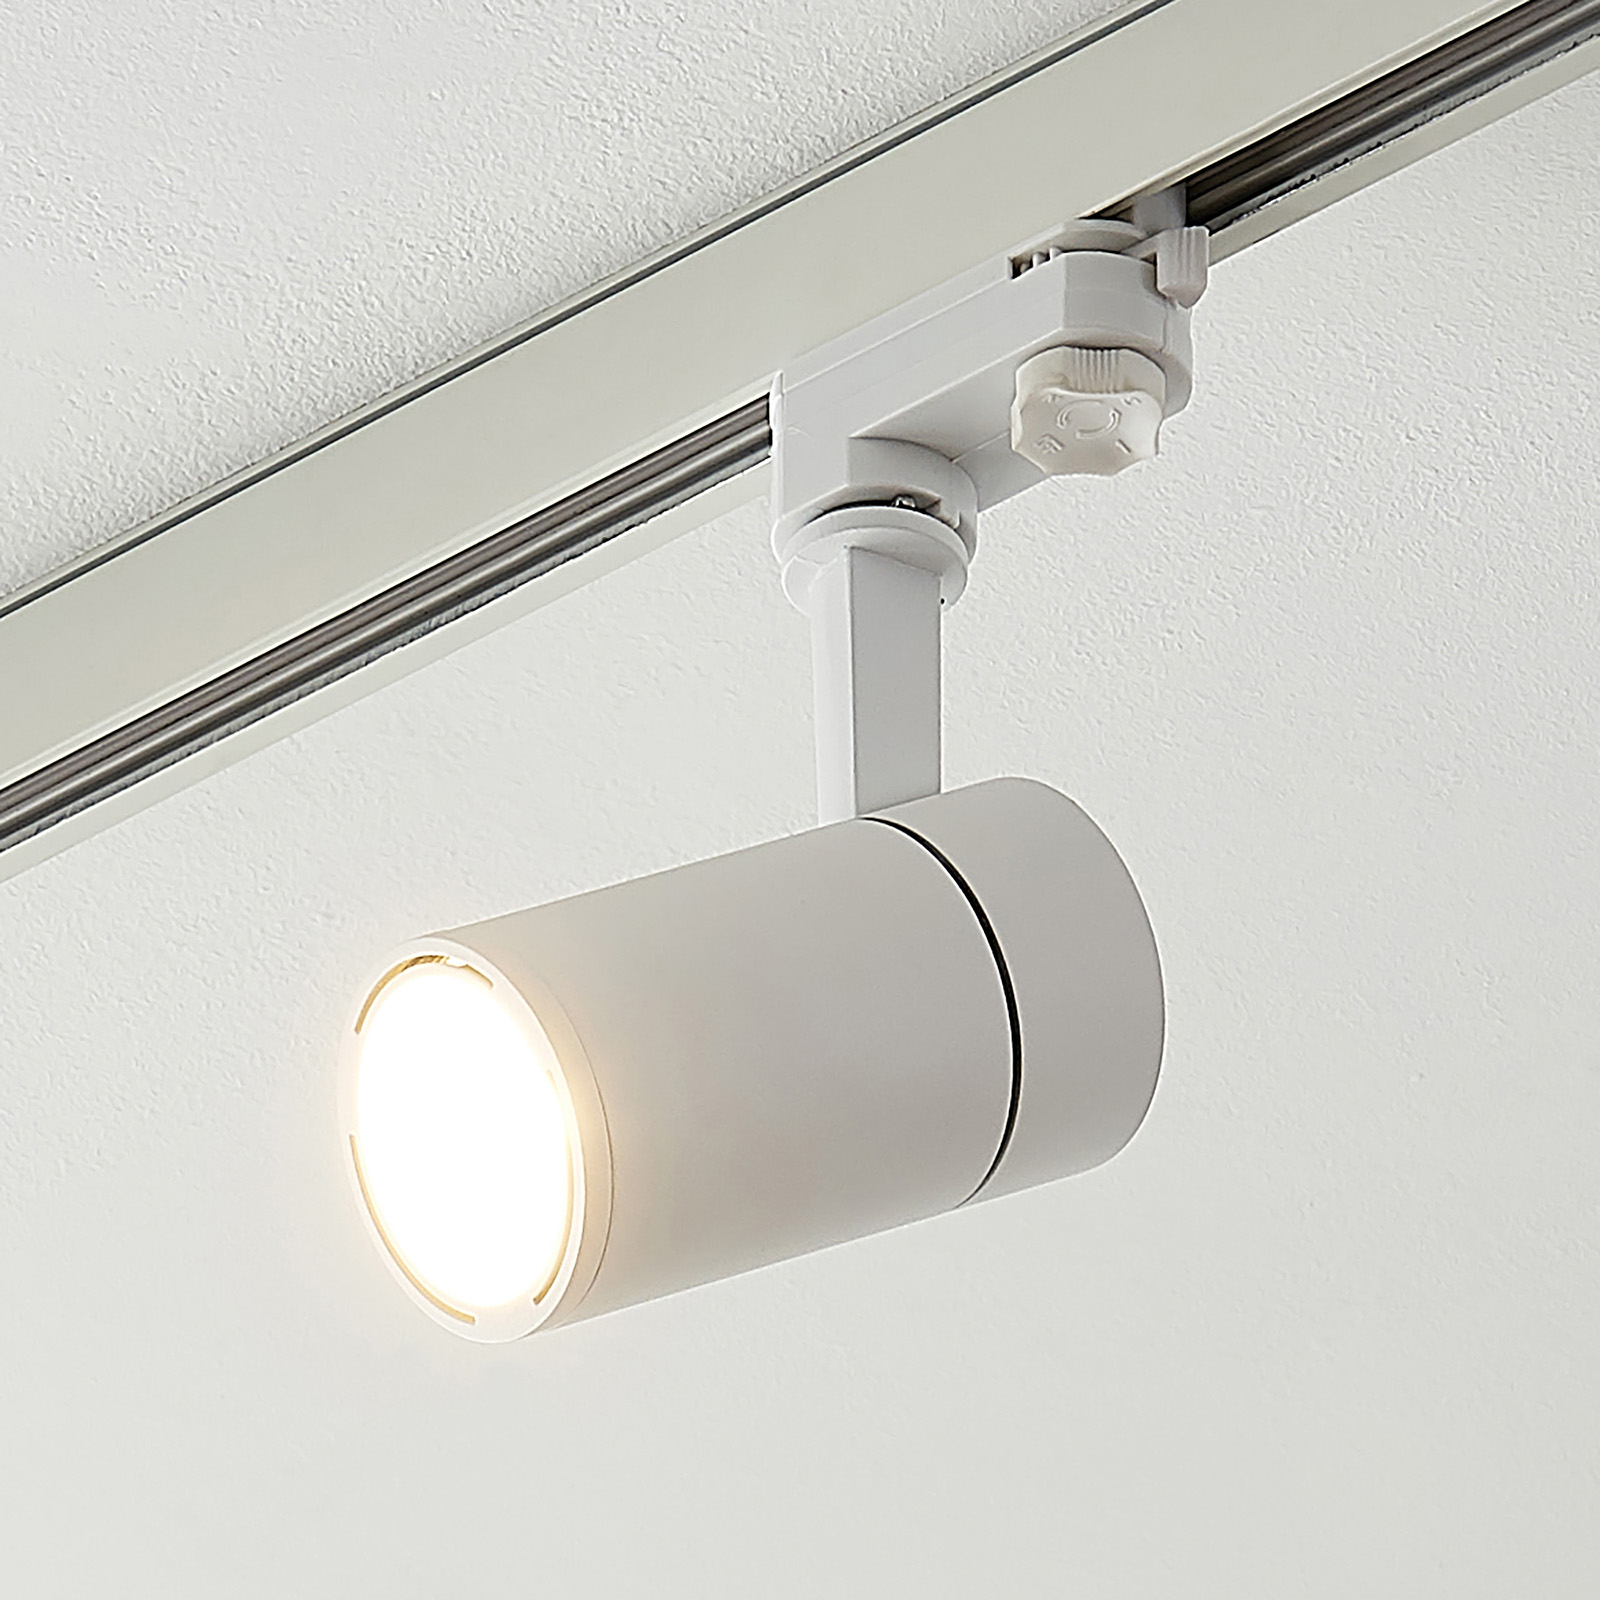 Arcchio Cady LED-kiskovalaisin, valkoinen 36° 12W